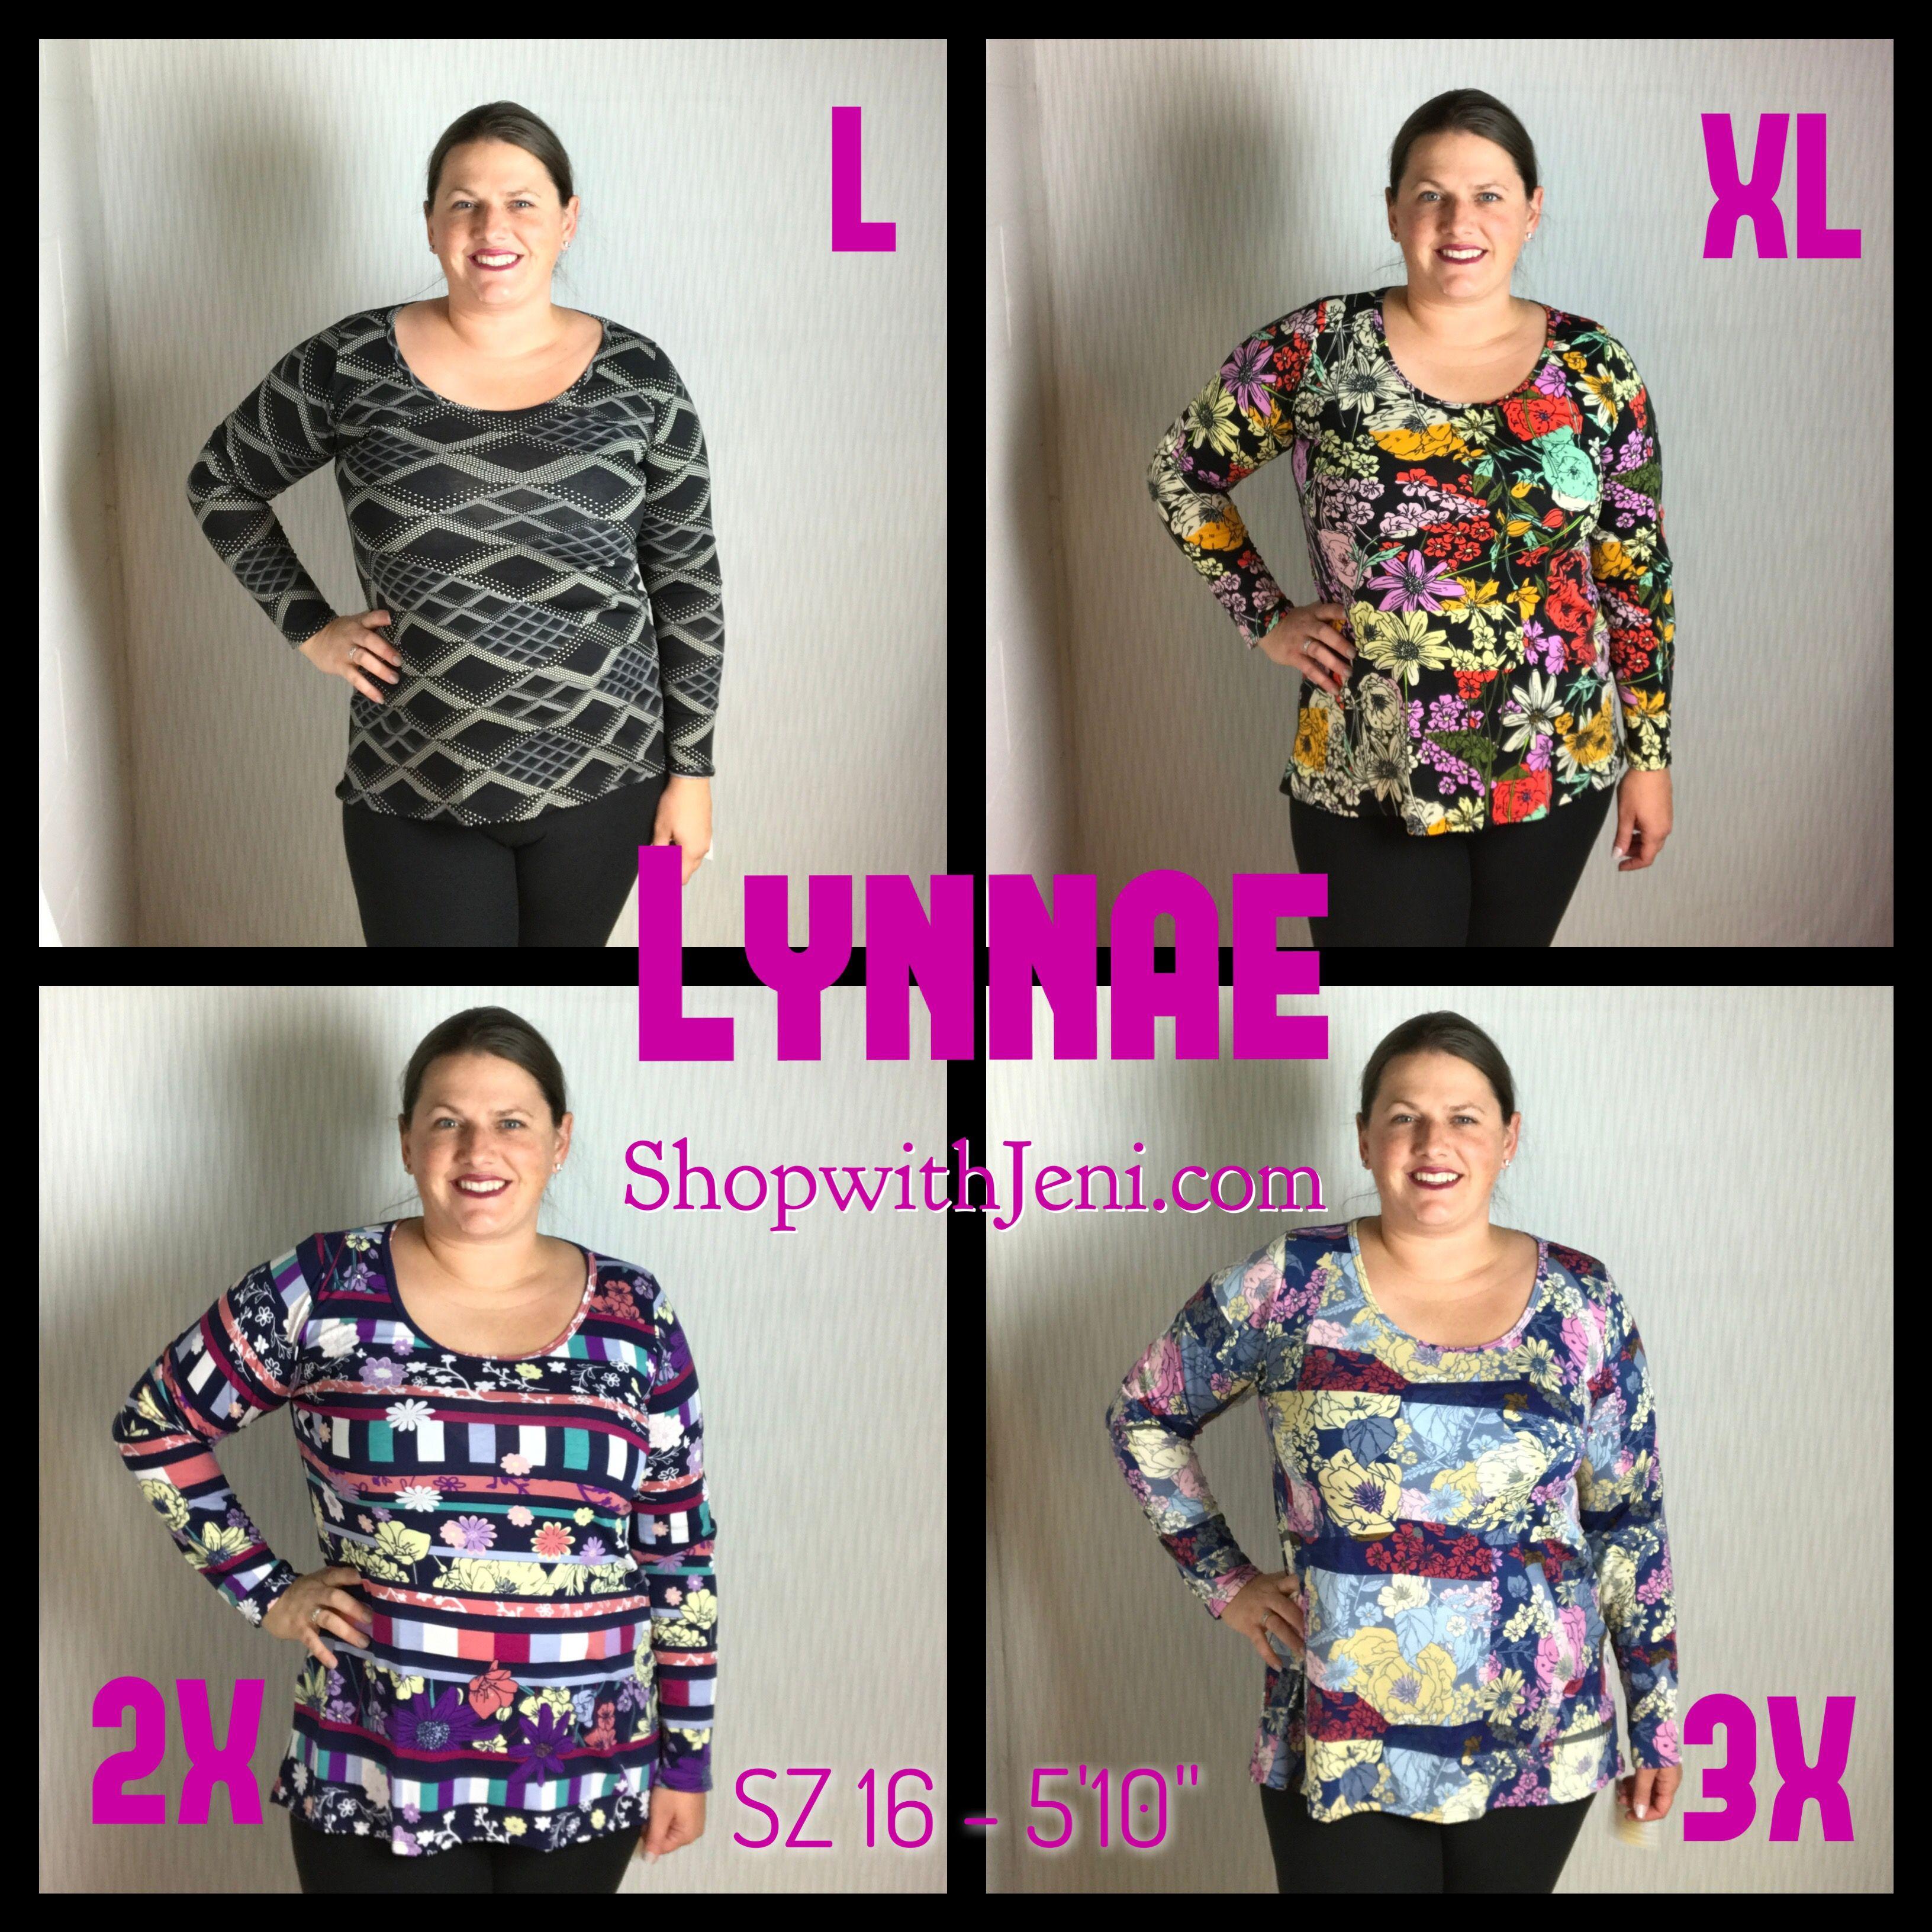 7a02bbbff4fd32 LuLaRoe Lynnae new style sizing! Cute long sleeve shirt womens clothing